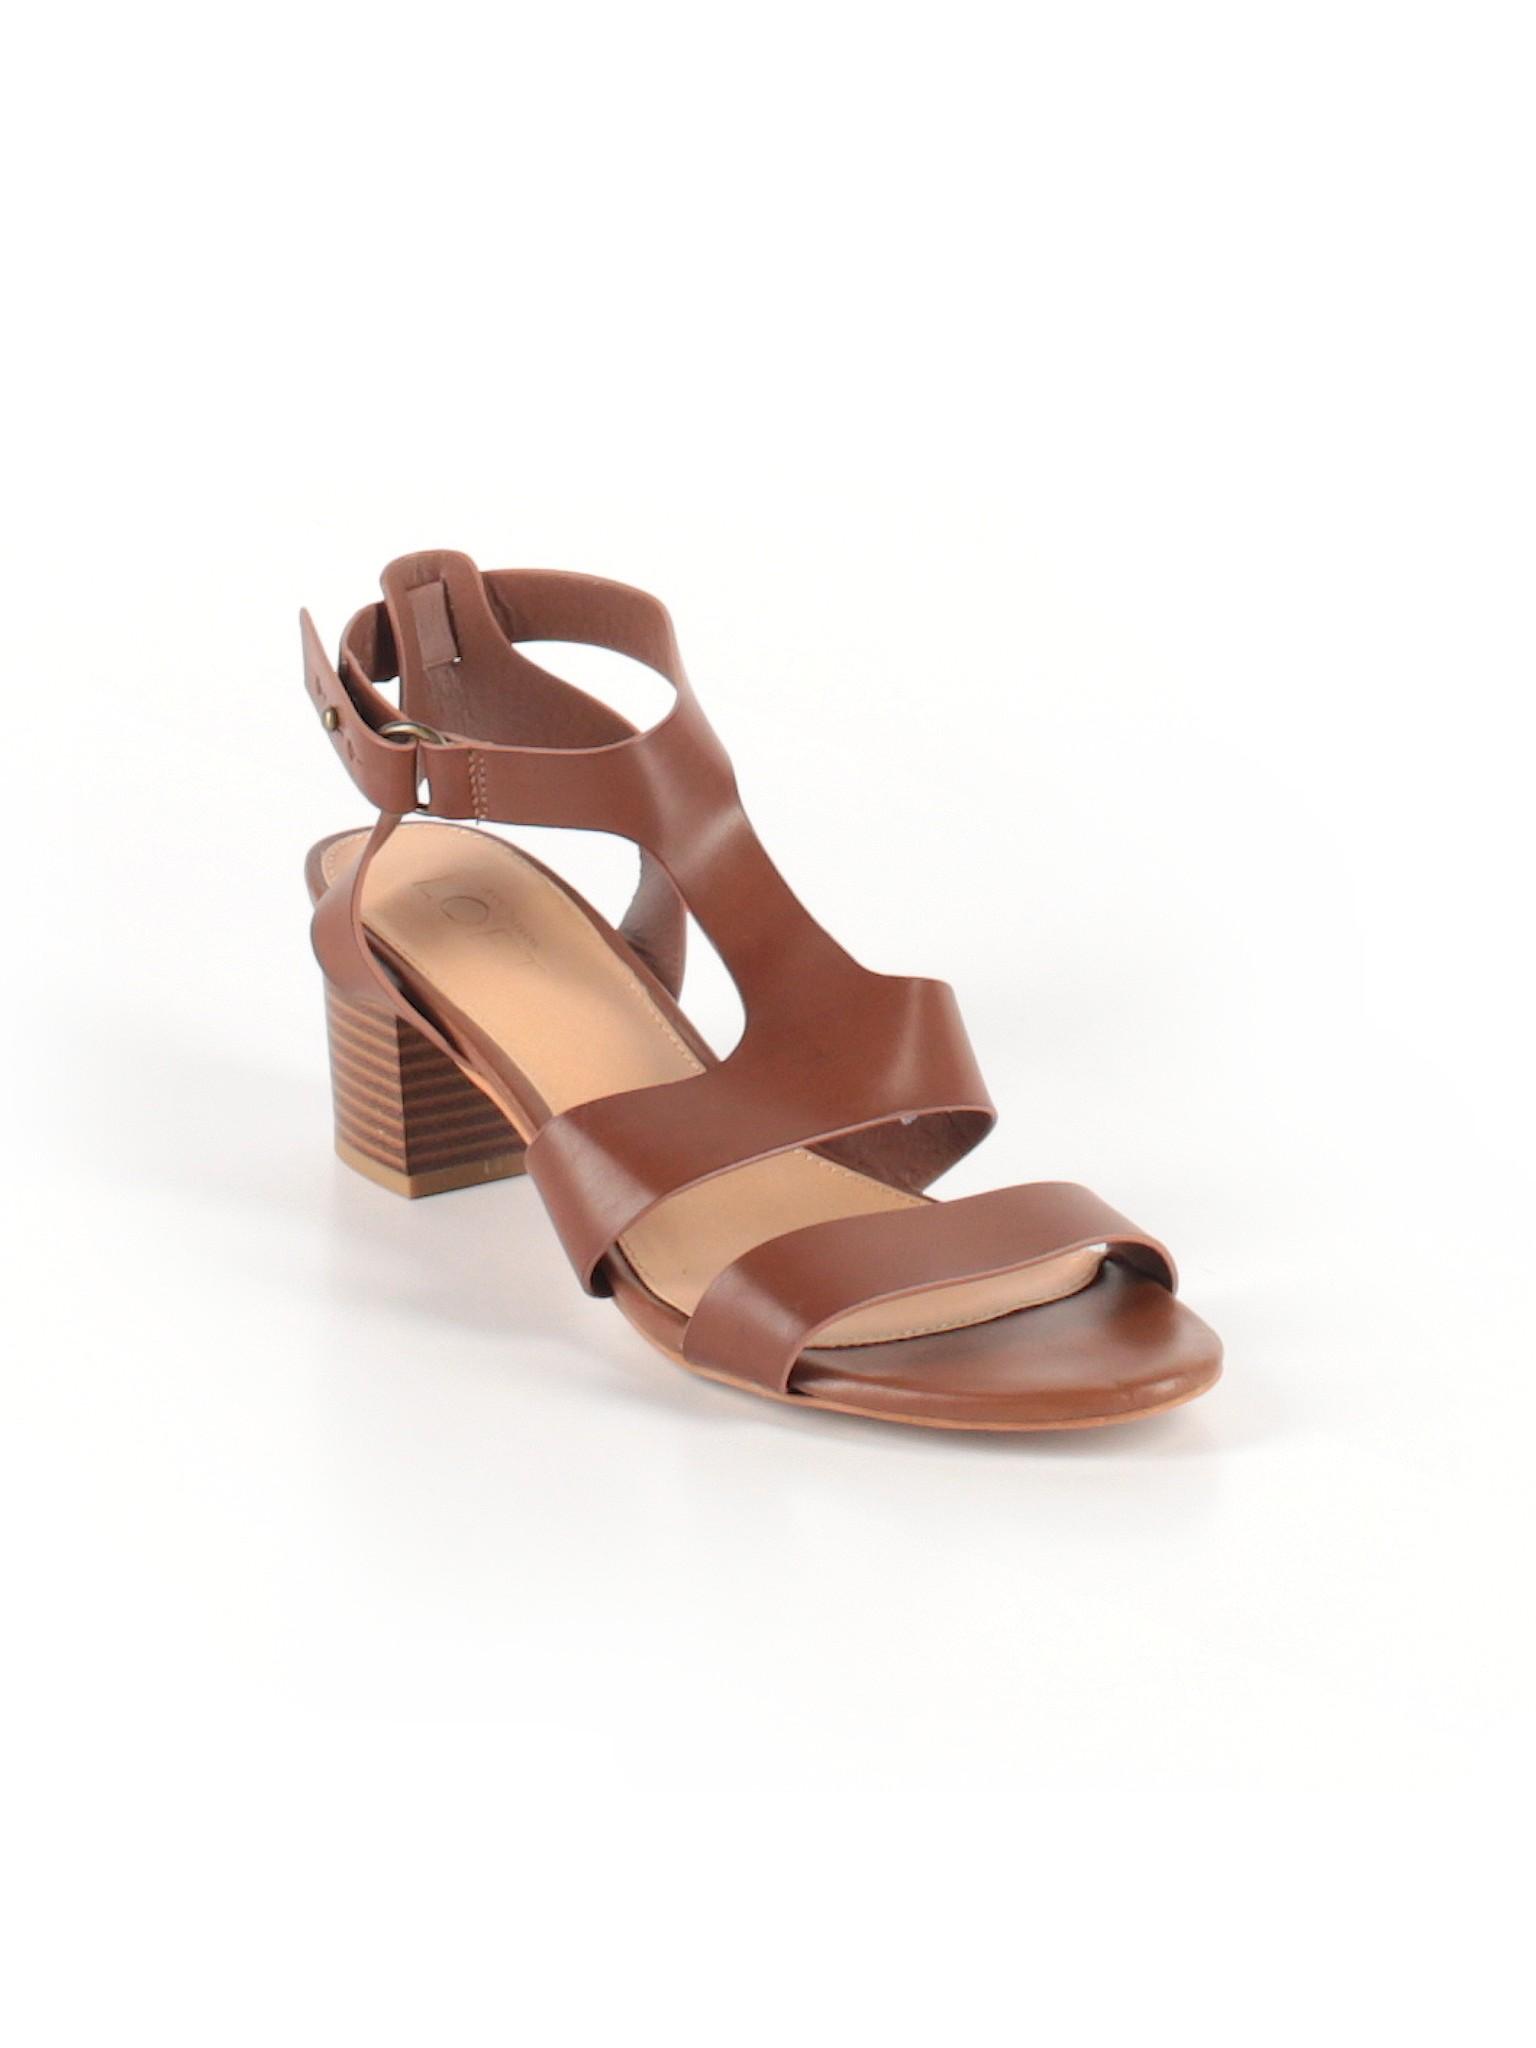 Boutique LOFT promotion Ann Taylor Heels AqA6rv